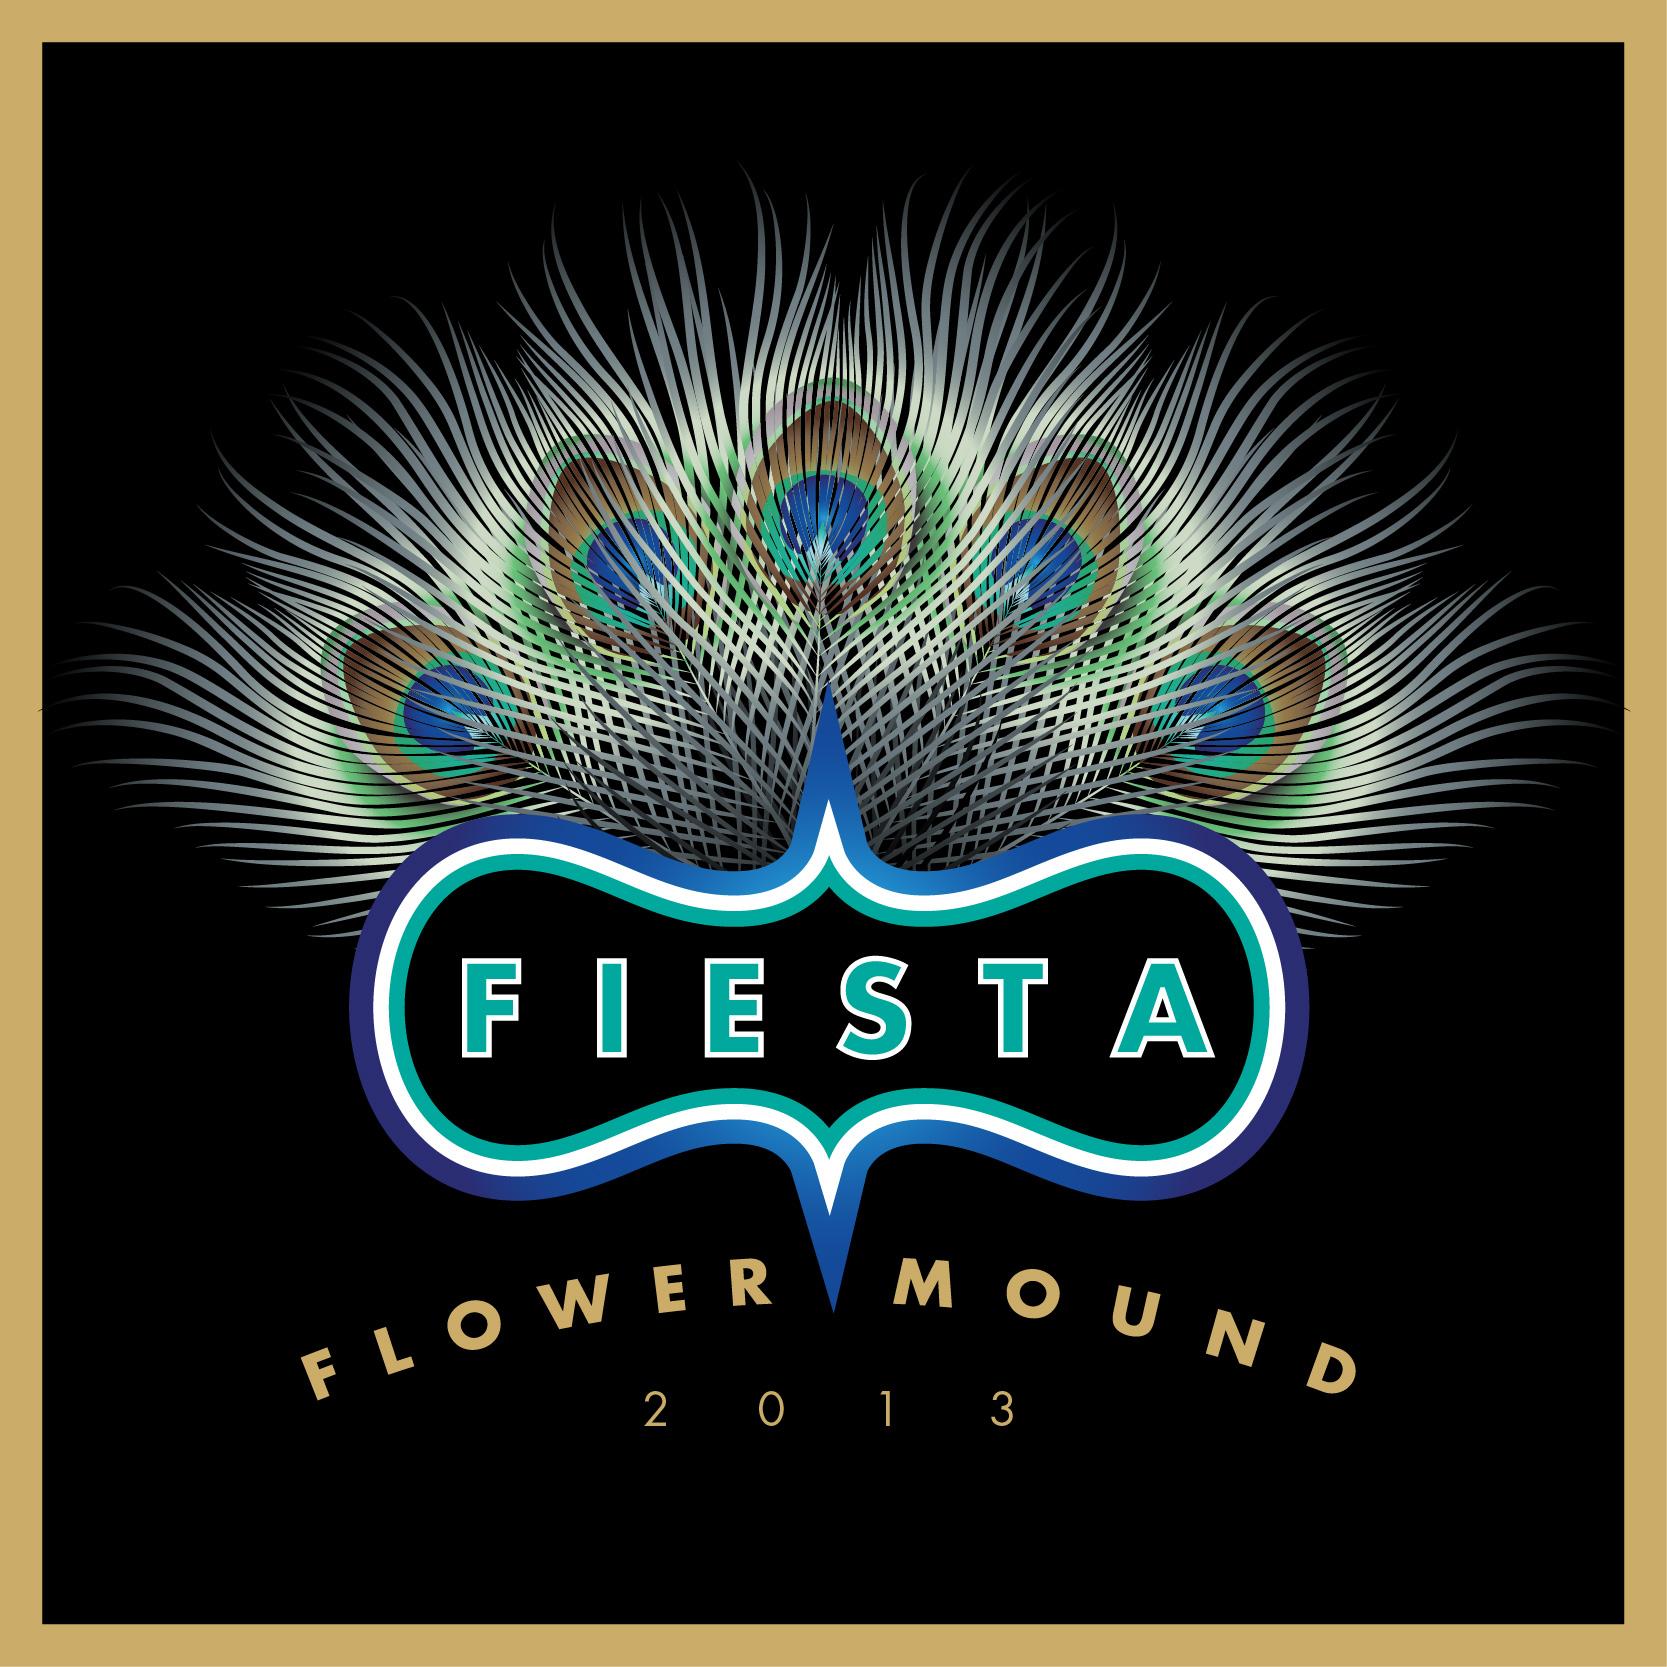 Fiesta_2013.jpg